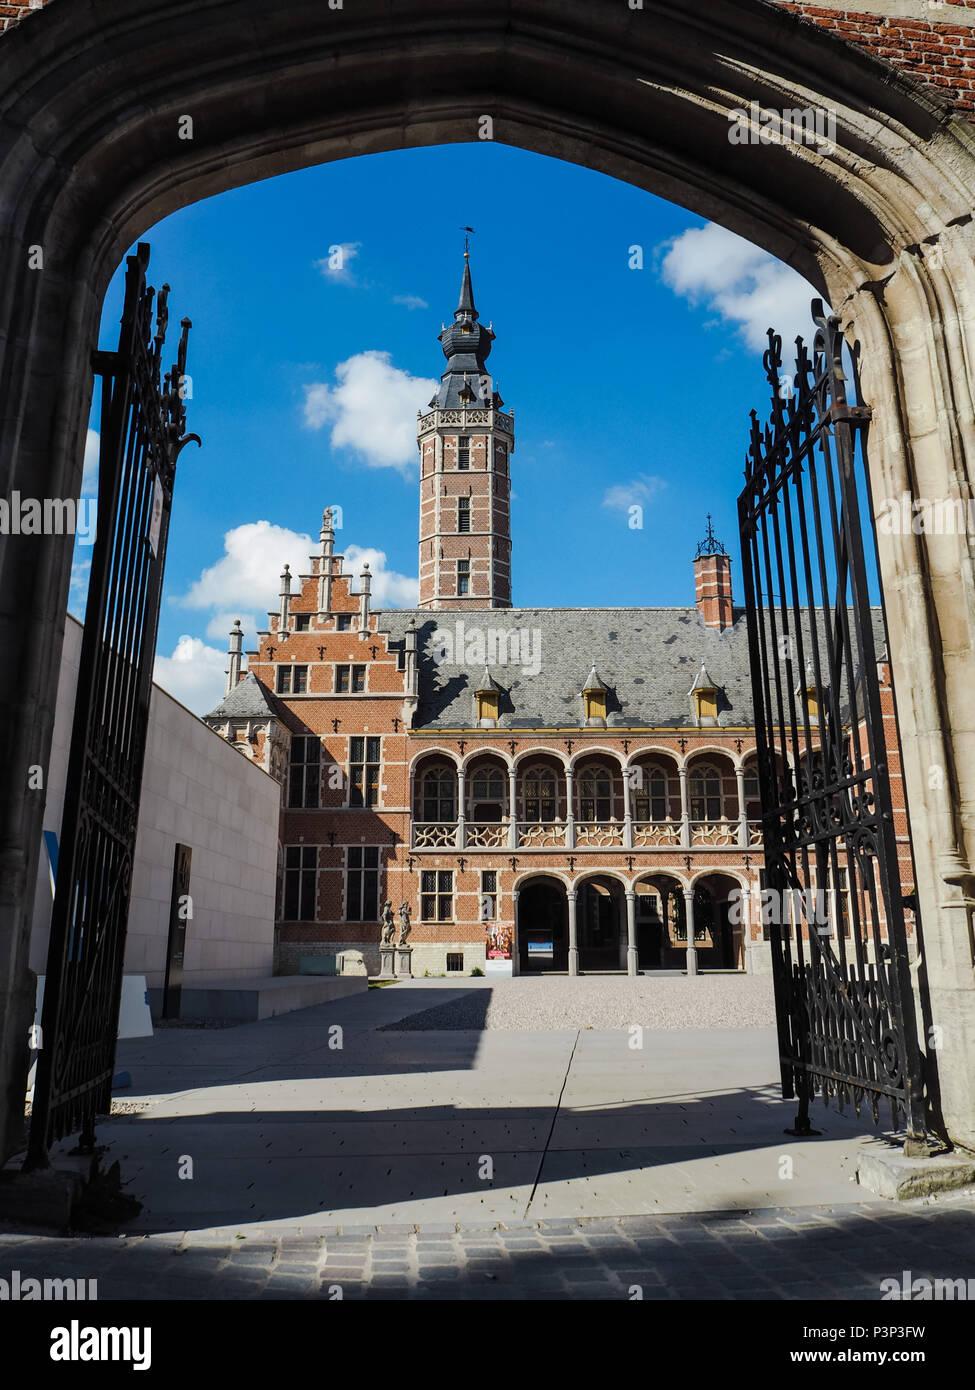 Entrance to the newly renovated museum Hof van Buysleyden focussing on Burgundian court culture, located in Mechelen, Belgium Stock Photo